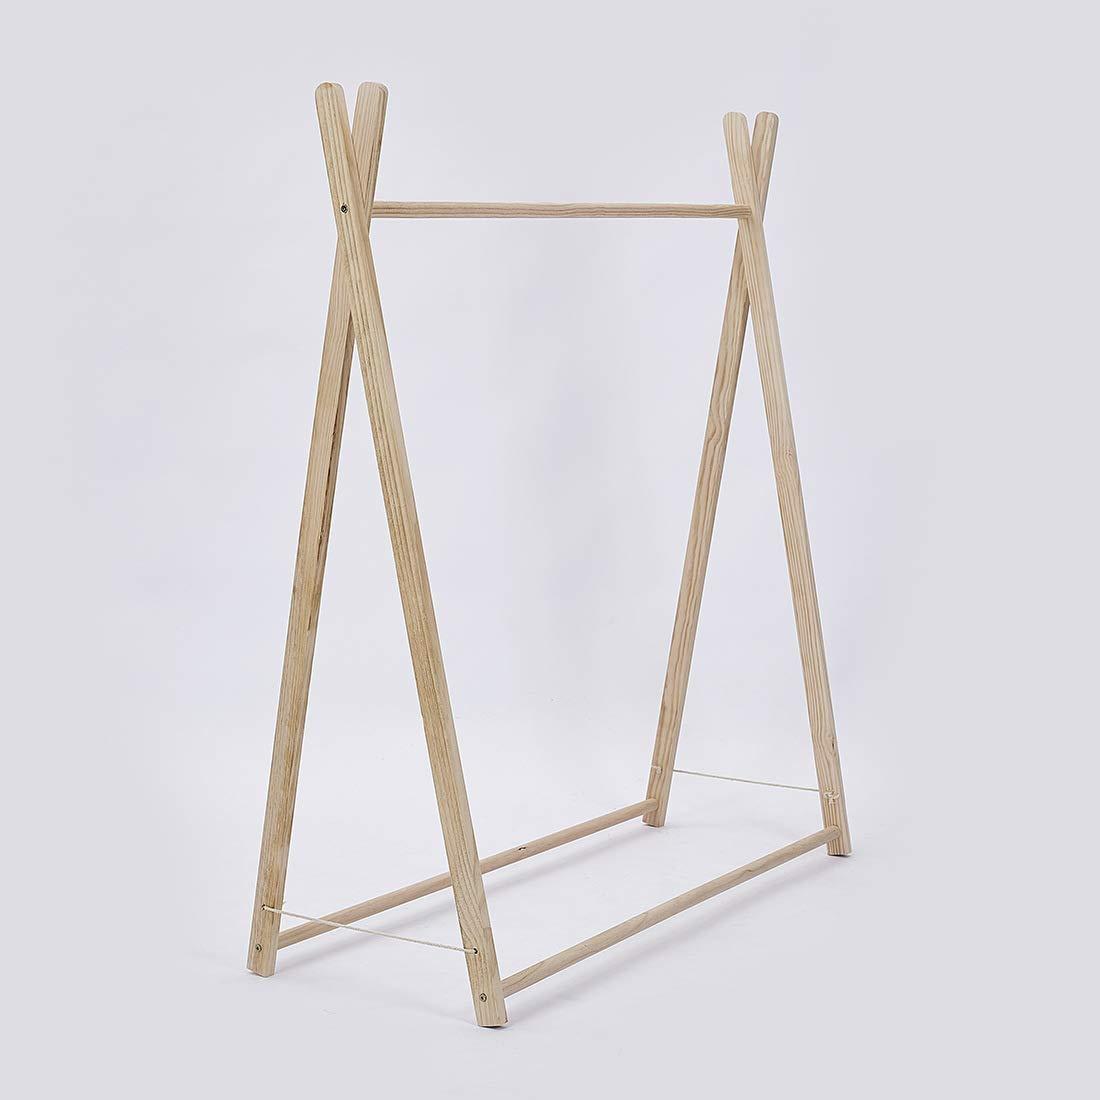 Zhenyu Children's Simple Triangle Coat Rack Mobile Clothes Hanging Storage Rack Hanger Floor Rack Hanger (Wood Color)